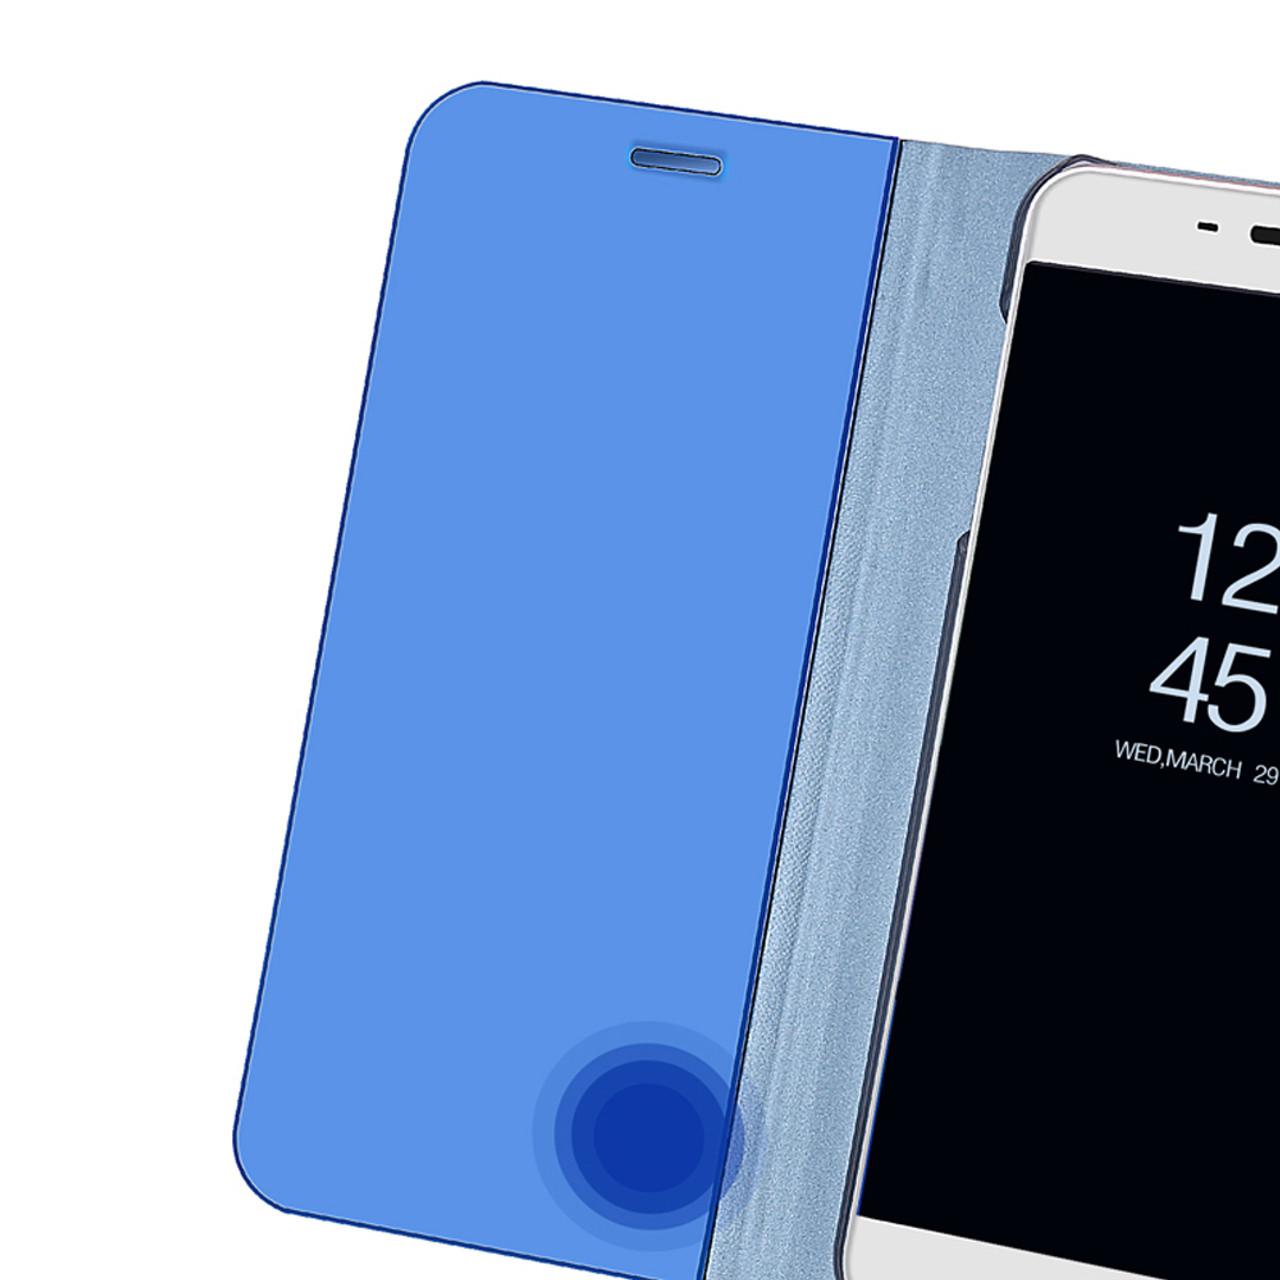 official photos ff0a1 8bfa3 Dreamysow Mirror Flip Case For Xiaomi Redmi 5 Plus Note 4 4X 5A Pro 32GB  64GB Mi A1 5X PU leather Clear View Phone Stand Cover